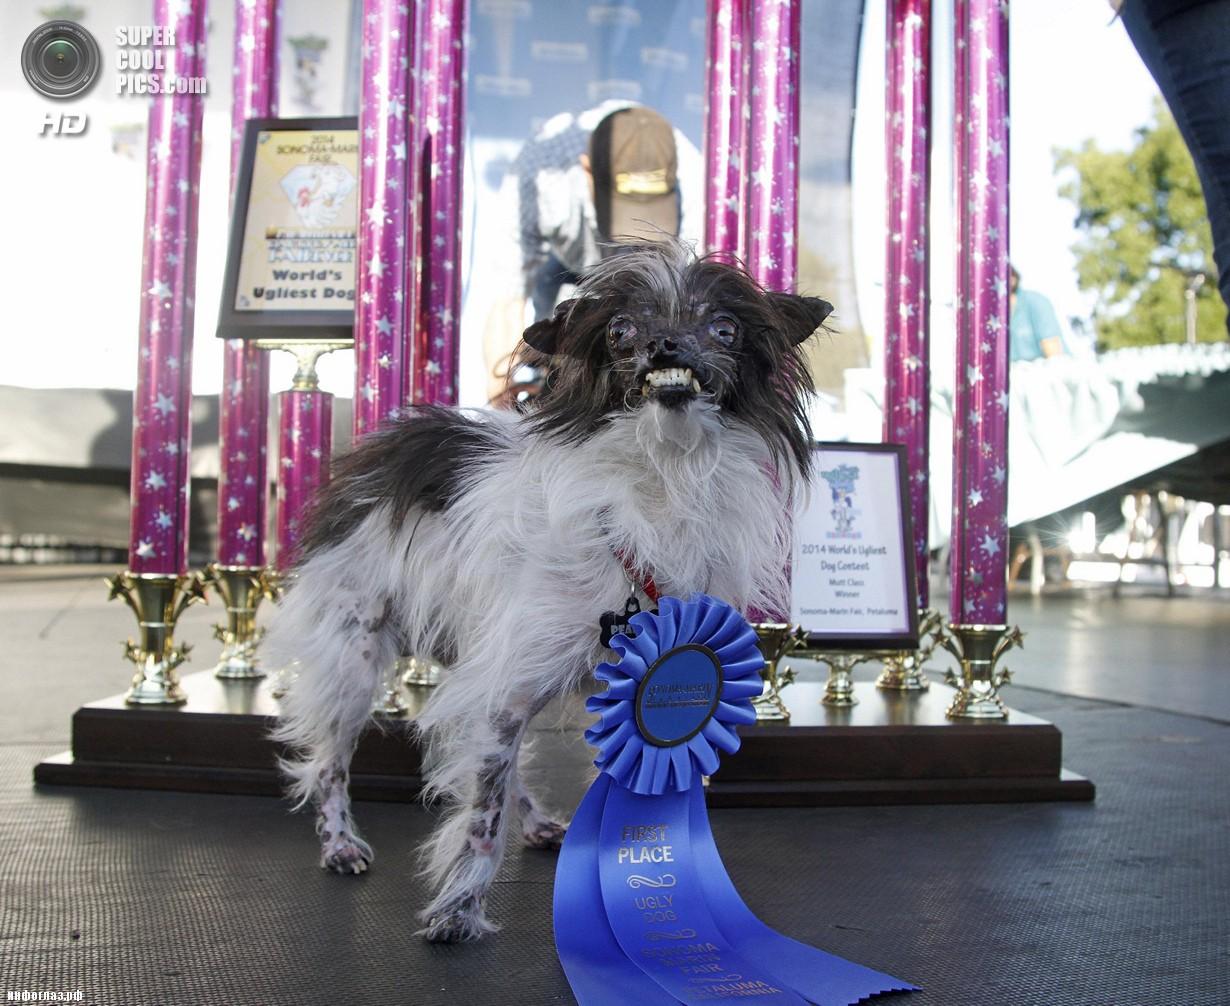 США. Петалума, Калифорния. 20 июня. Арахис во время награждения. (AP Photo/George Nikitin)